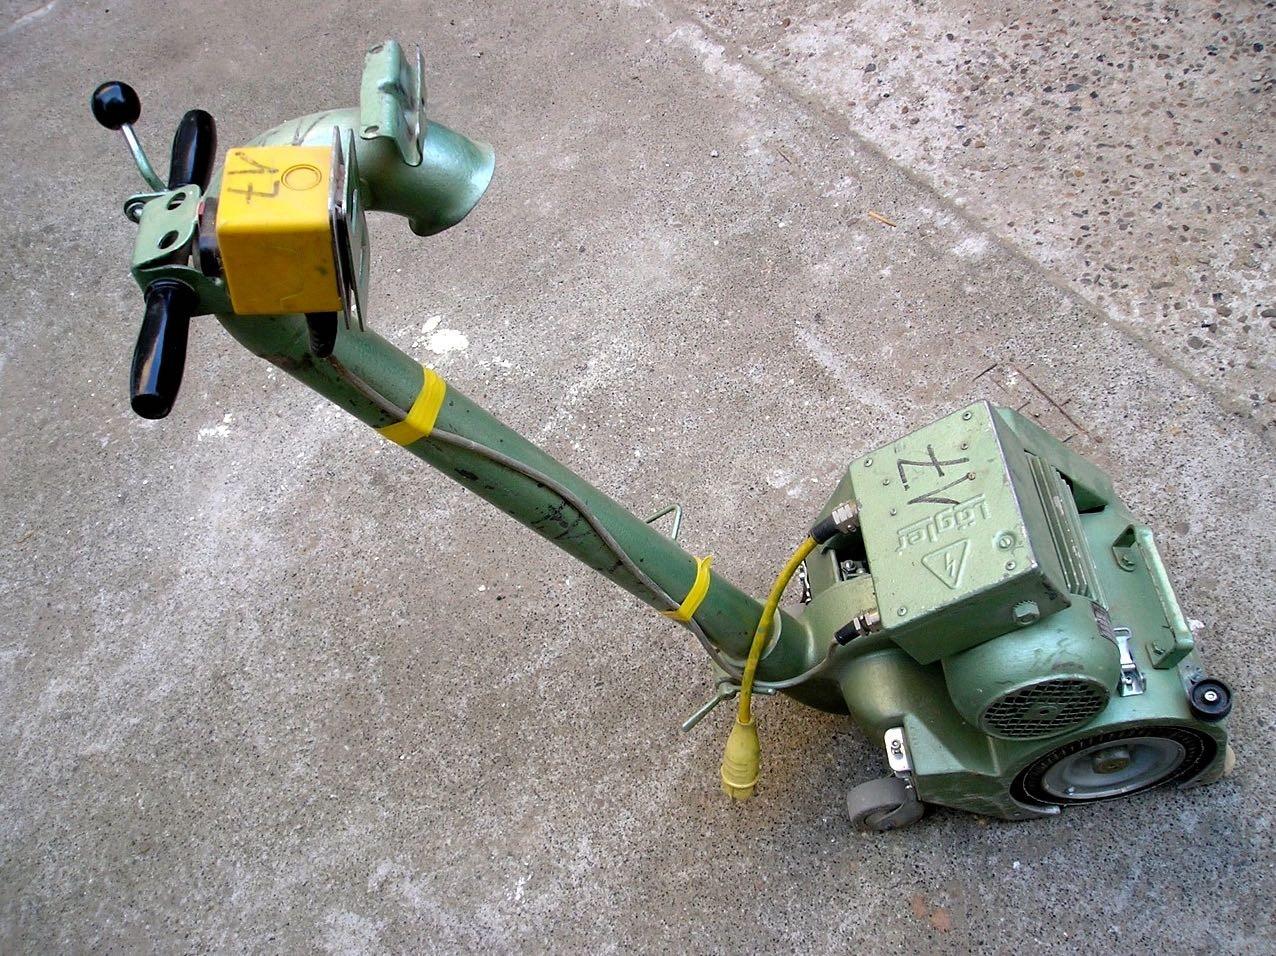 Parkettschleifmaschine Lägler Profit 40 Kg